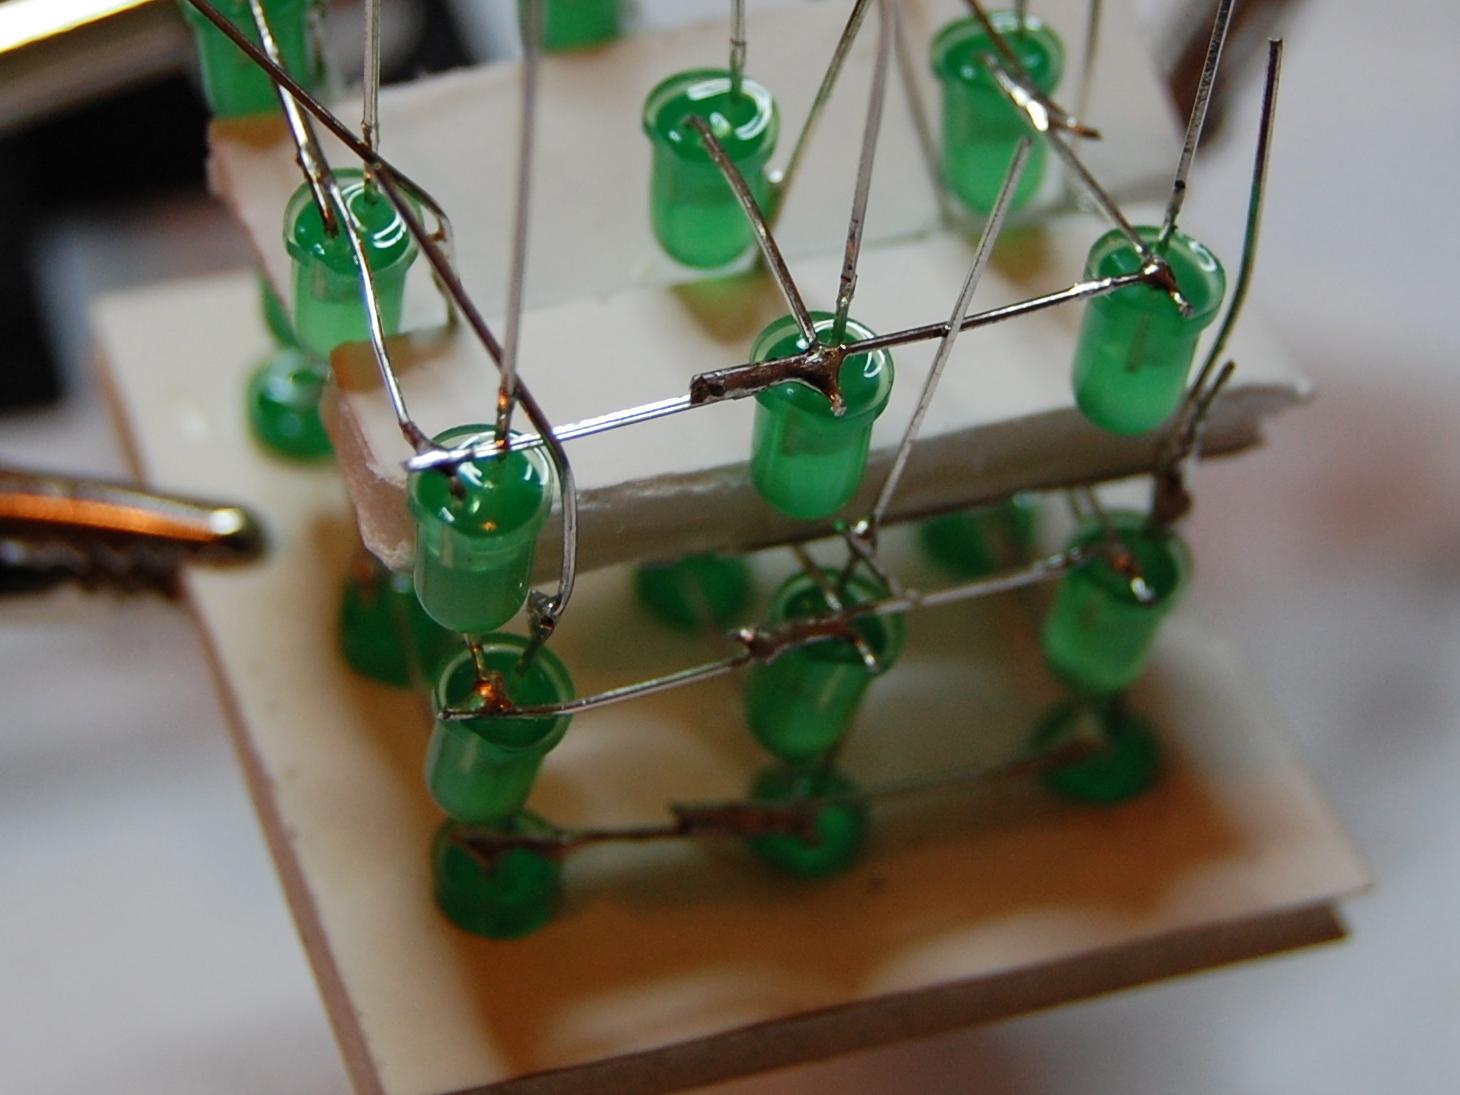 3x3x3 LED Cube ArduinoShield